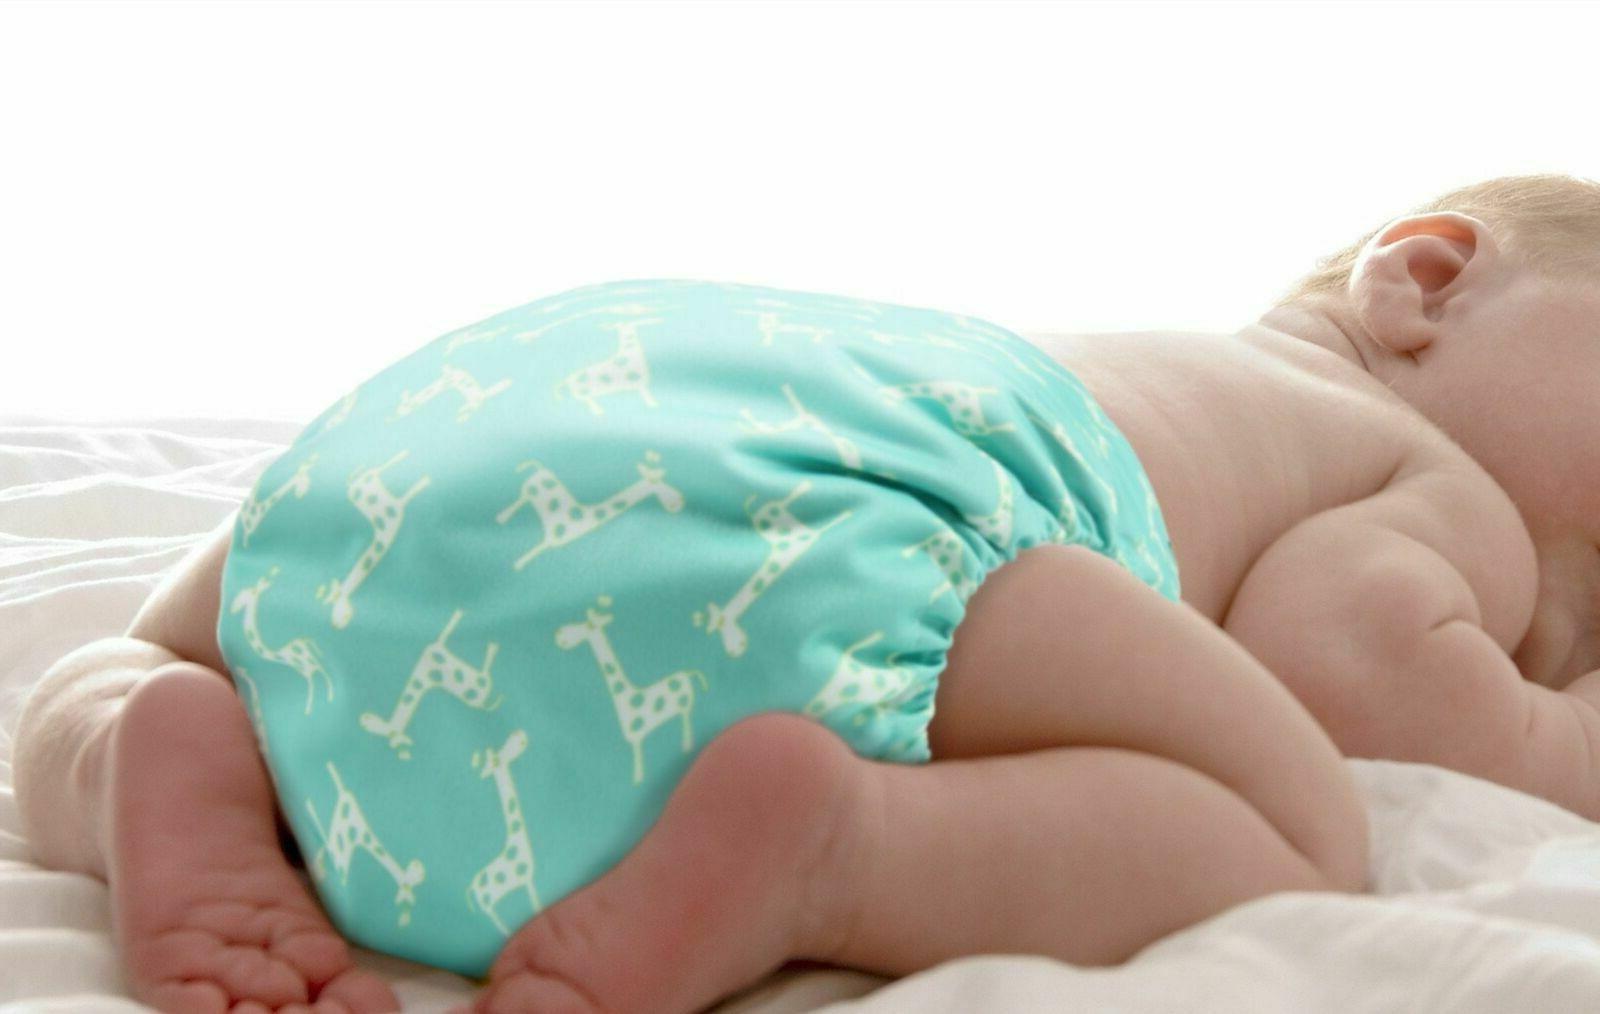 4 Para Ecologicos 0-24 Bebés Reutilizables Set